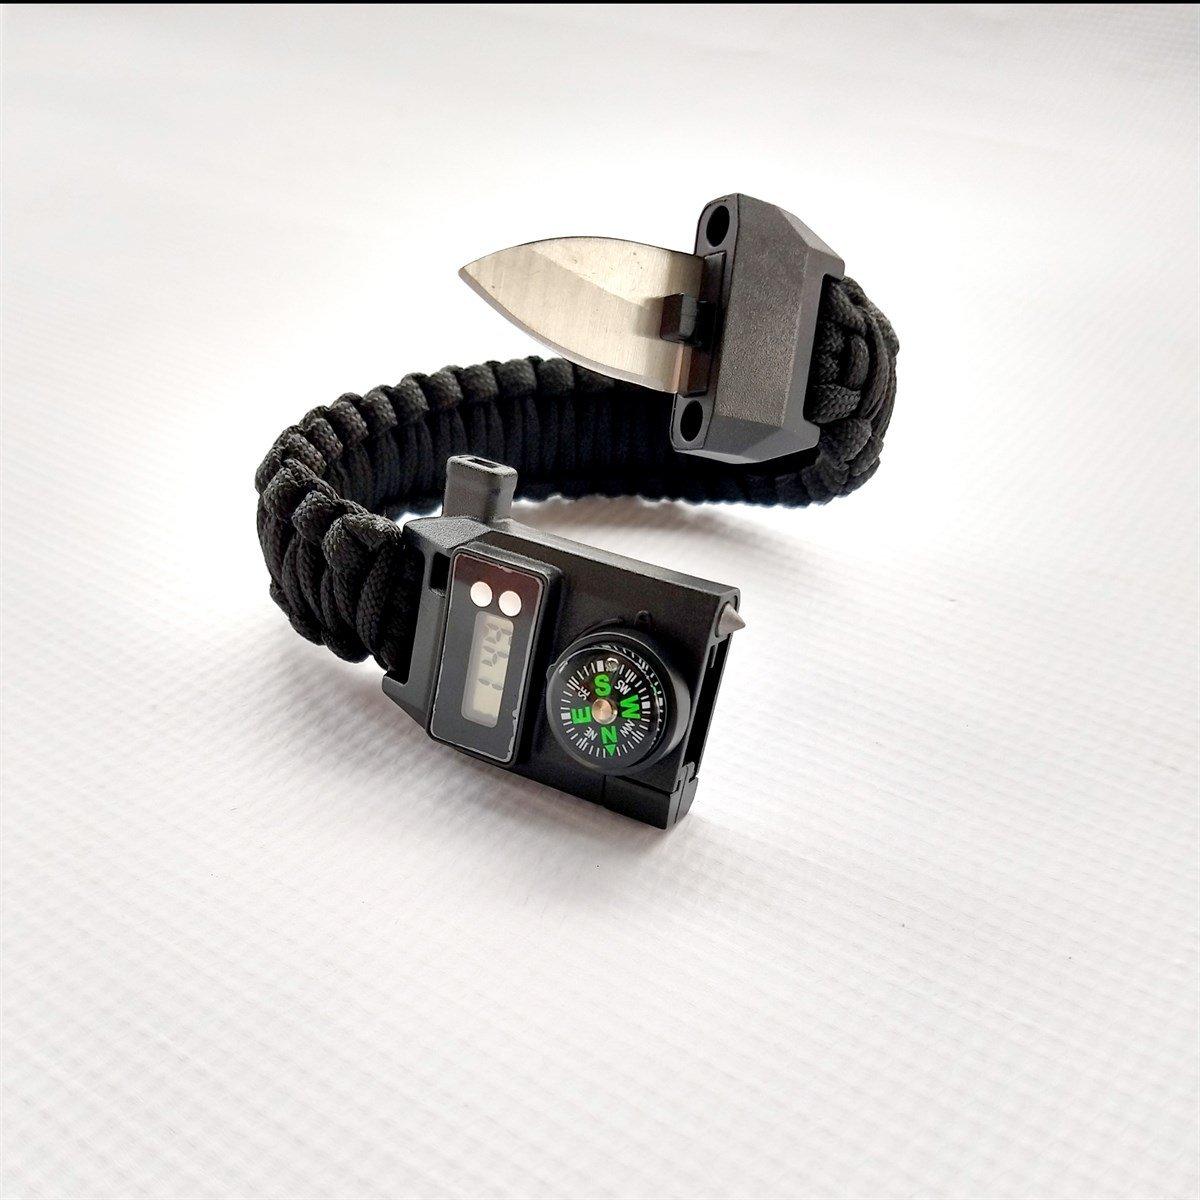 Image of Digital Clock Multi Tool Survival Bracelet